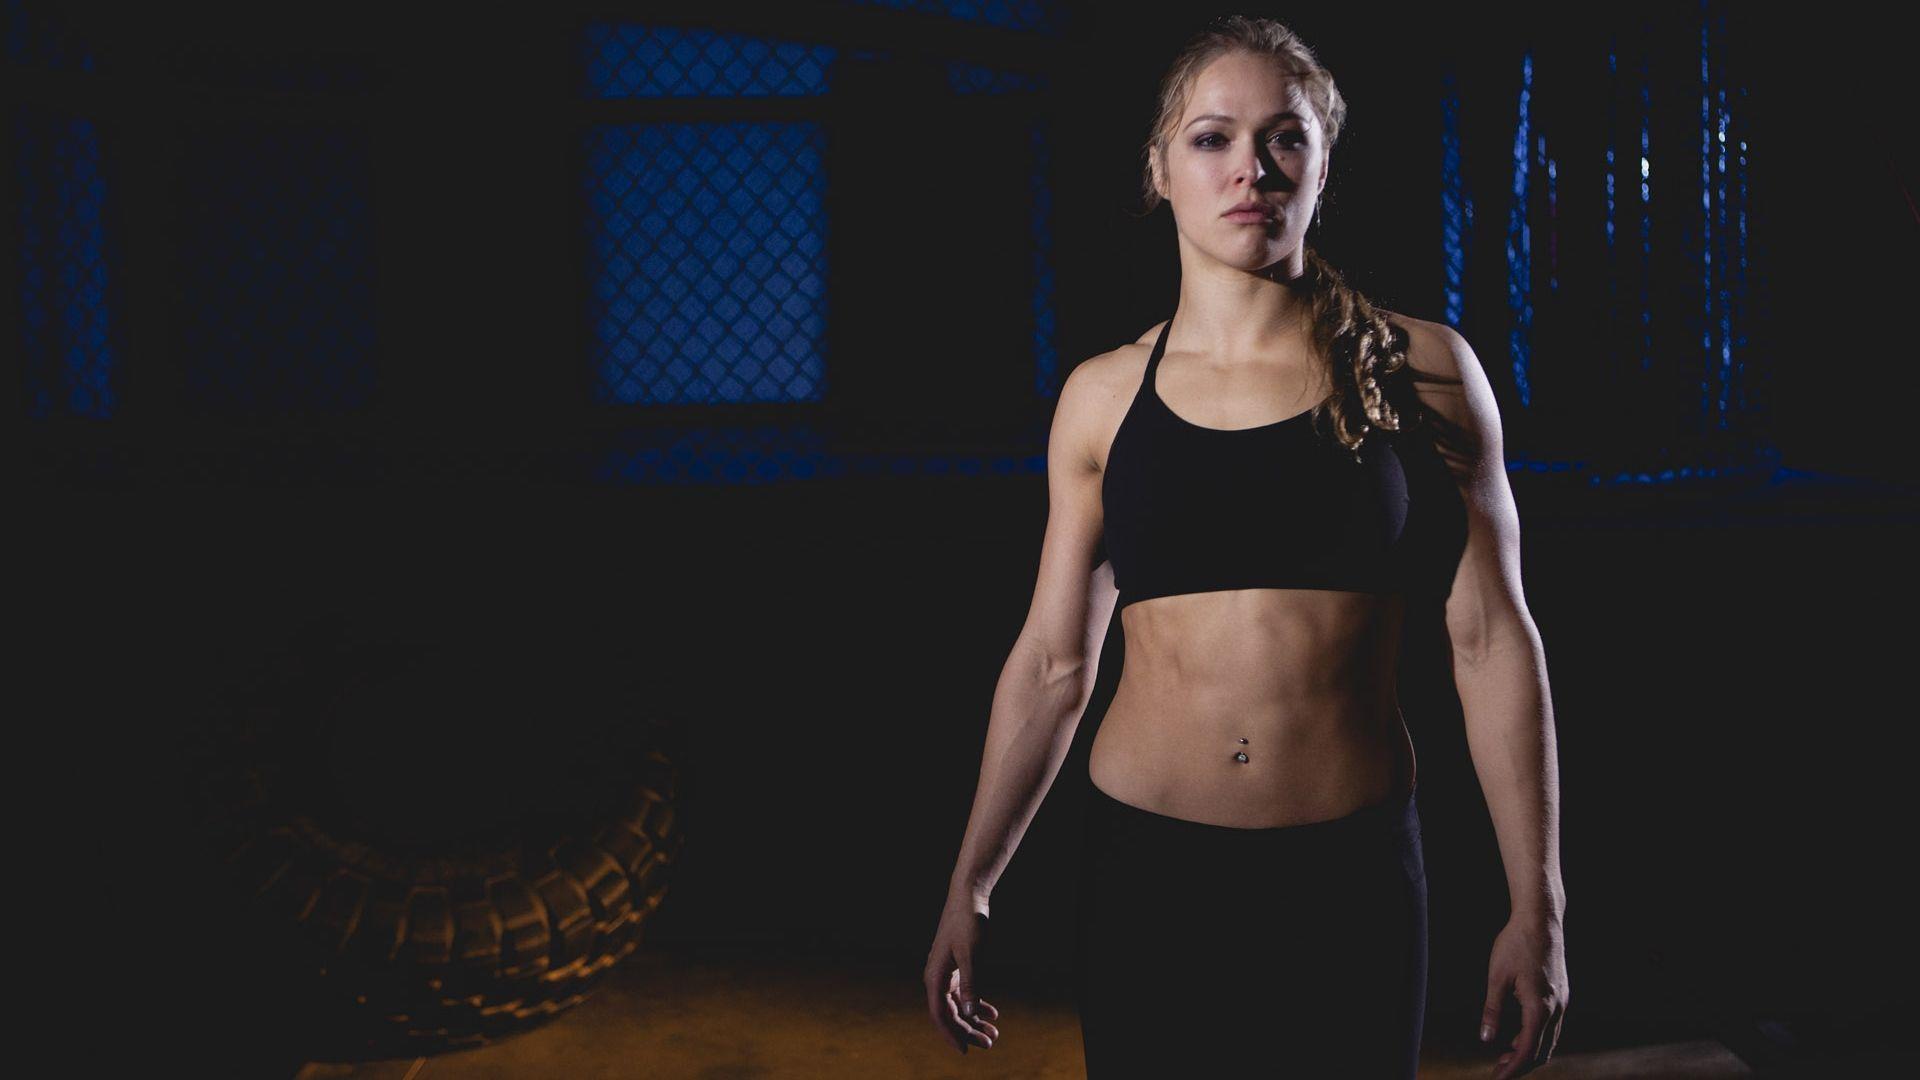 Ronda Rousey Download Wallpaper